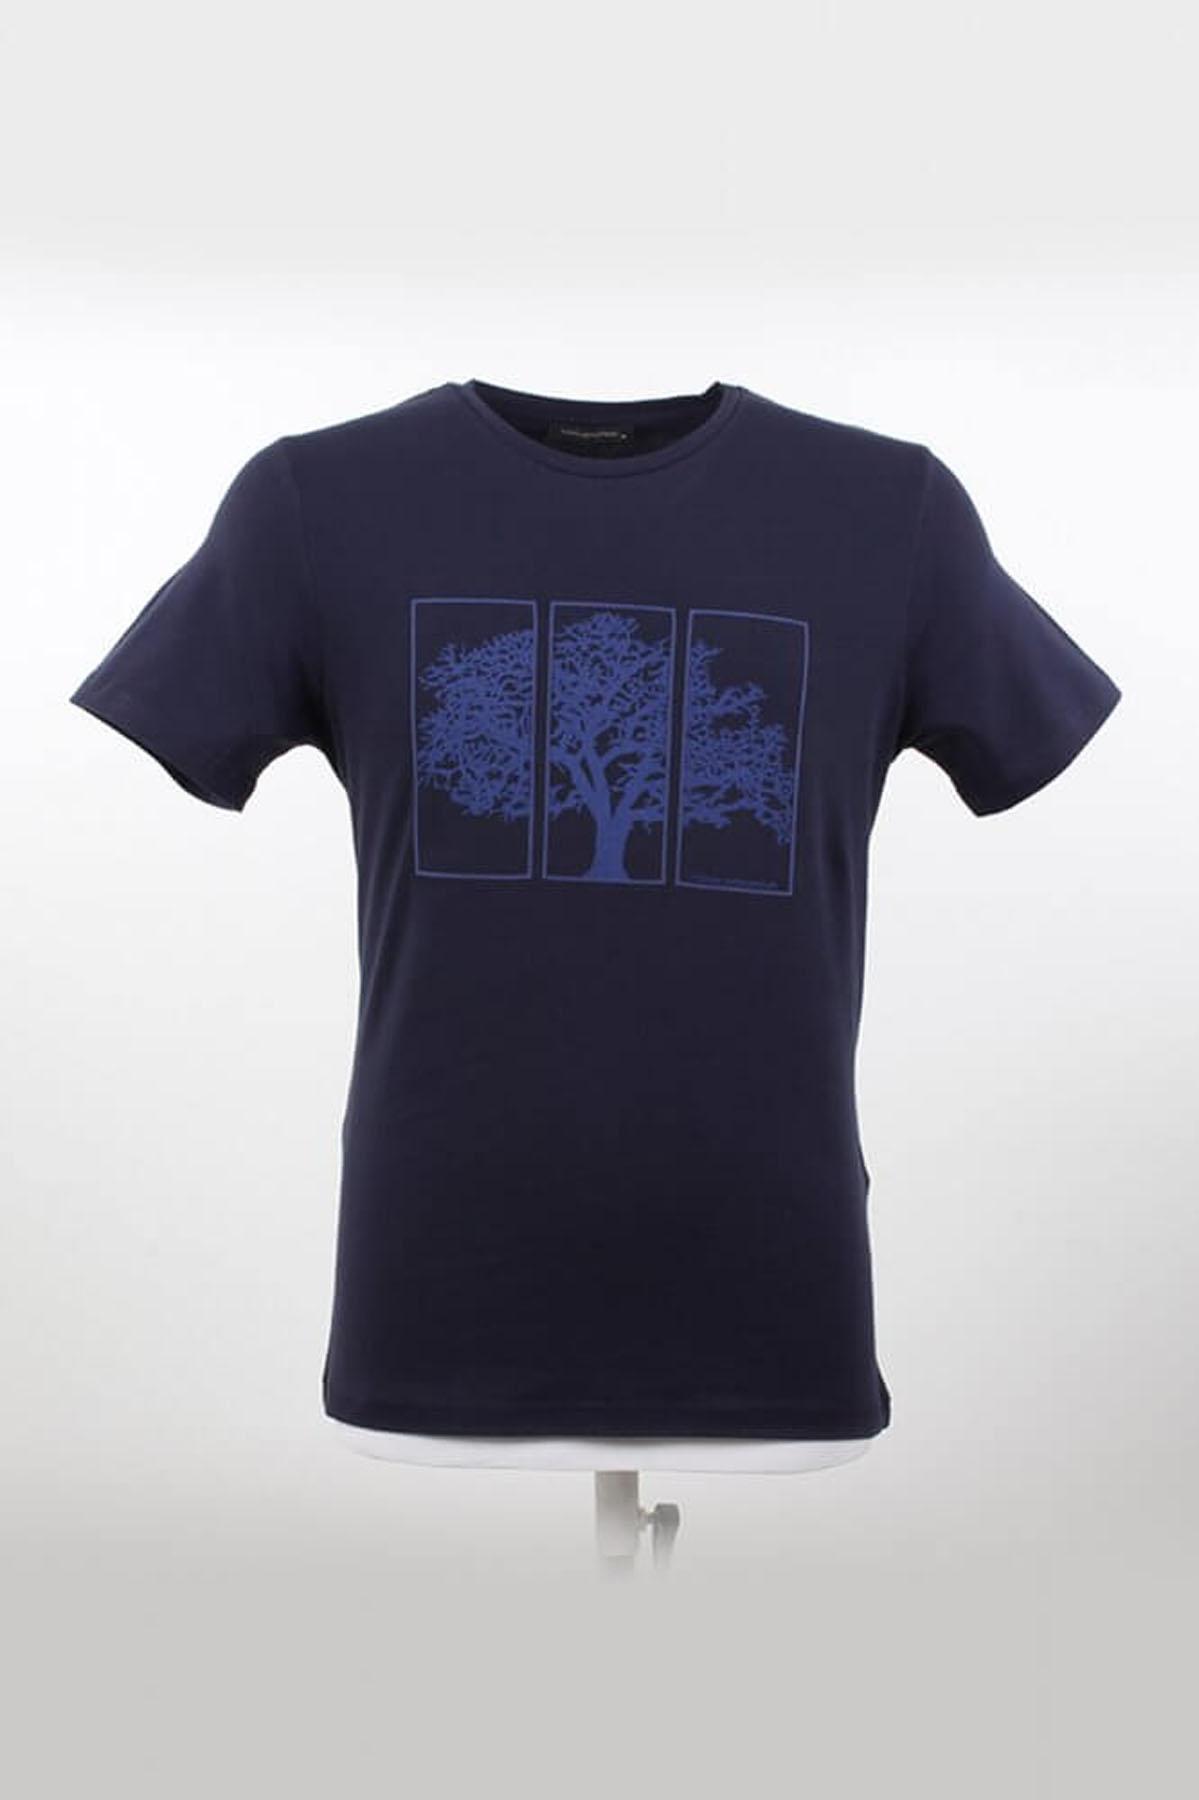 Bisiklet Yaka Ağaç Desenli Lacivert T-Shirt